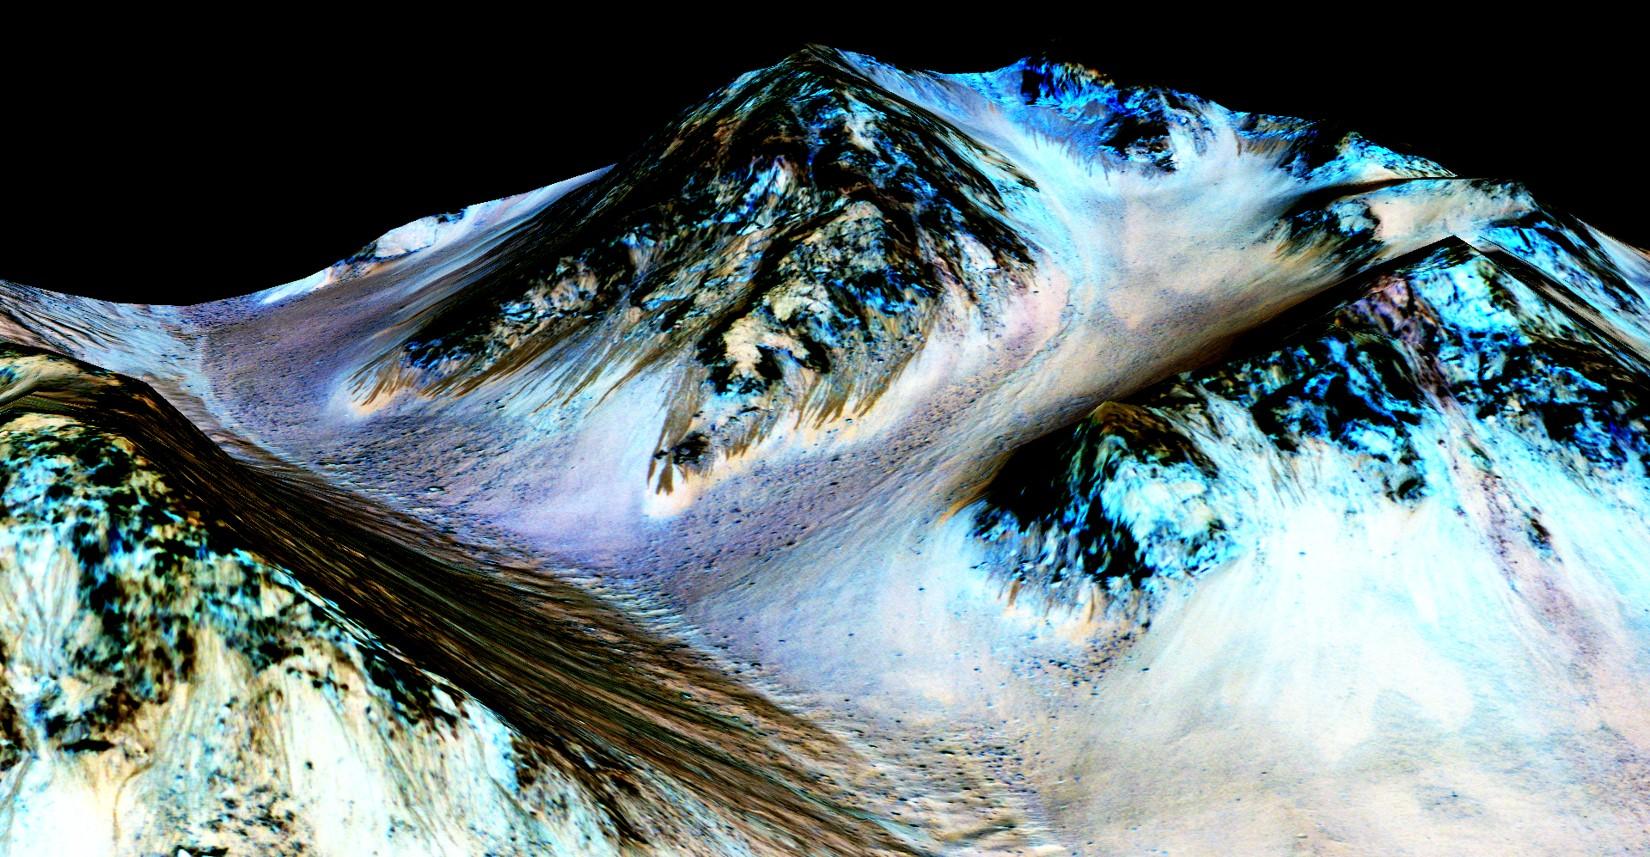 Сезонные потоки насклонах, кратер Хейла (Hale Crater). Псевдоцвета винфракрасном ивидимом диапазоне. <i>NASA/JPL/University of Arizona</i>.